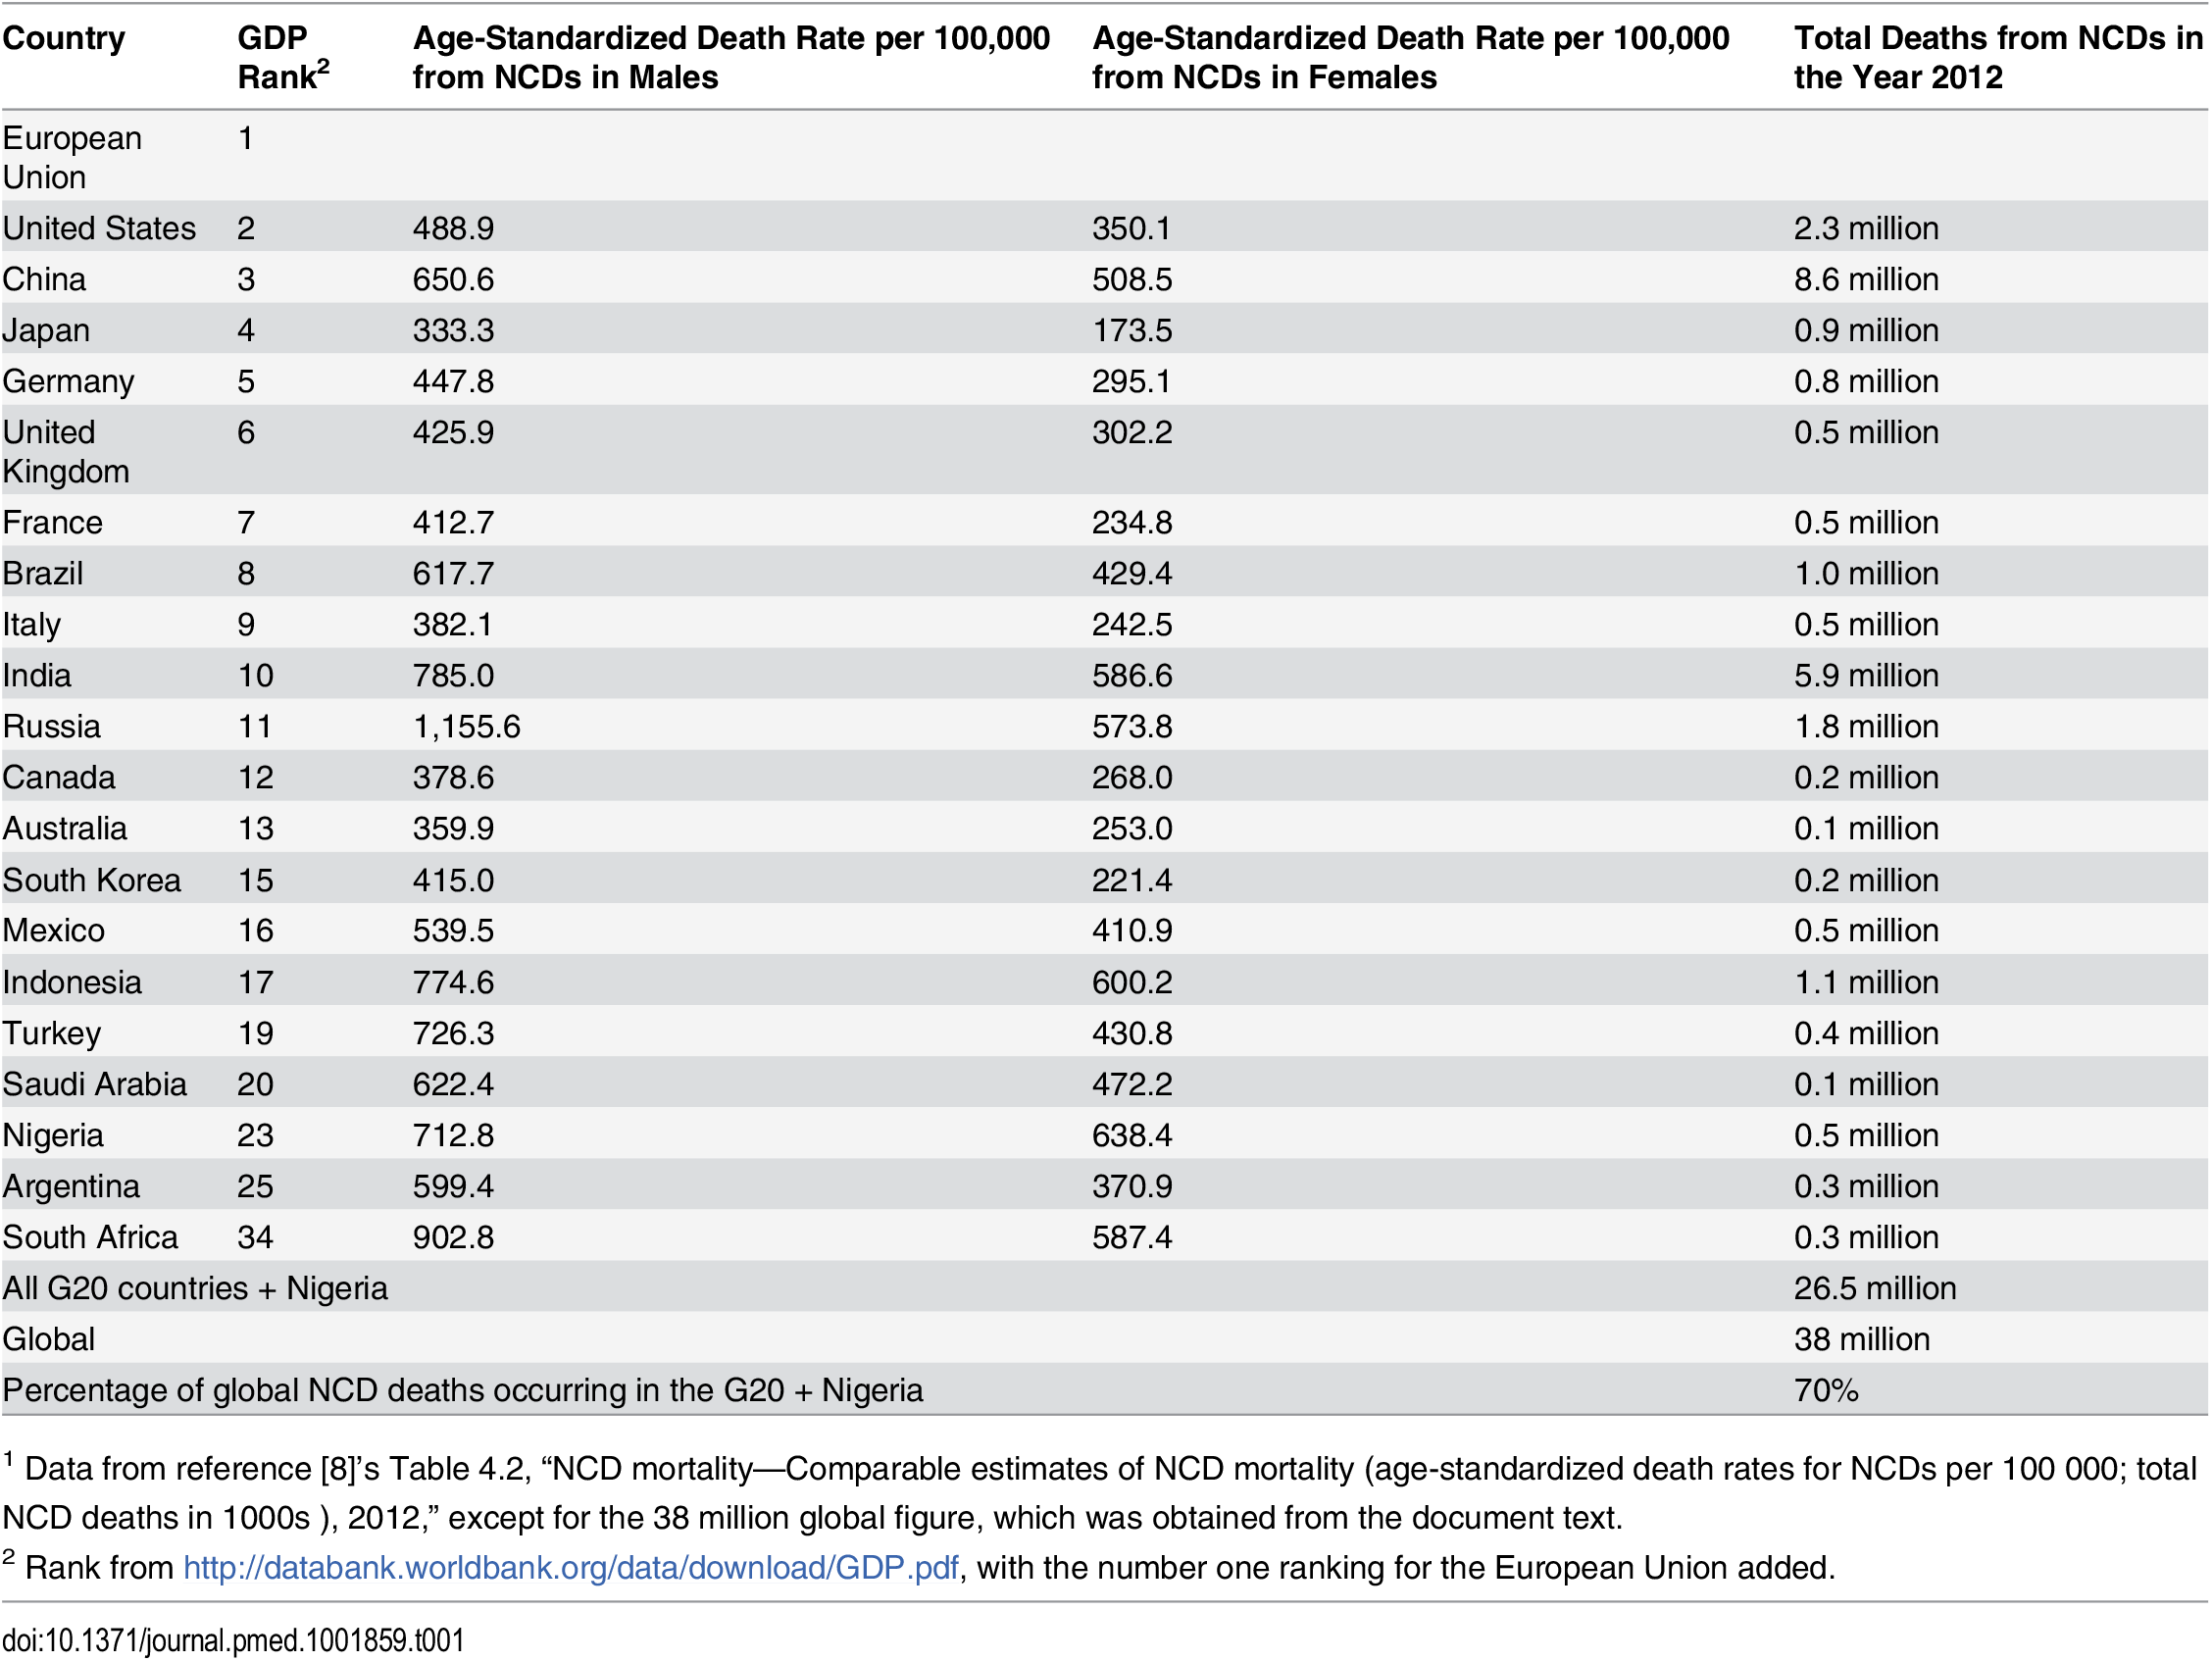 NCD mortality estimates in G20 countries + Nigeria, 2012<em class=&quot;ref&quot;><sup>1</sup></em>.